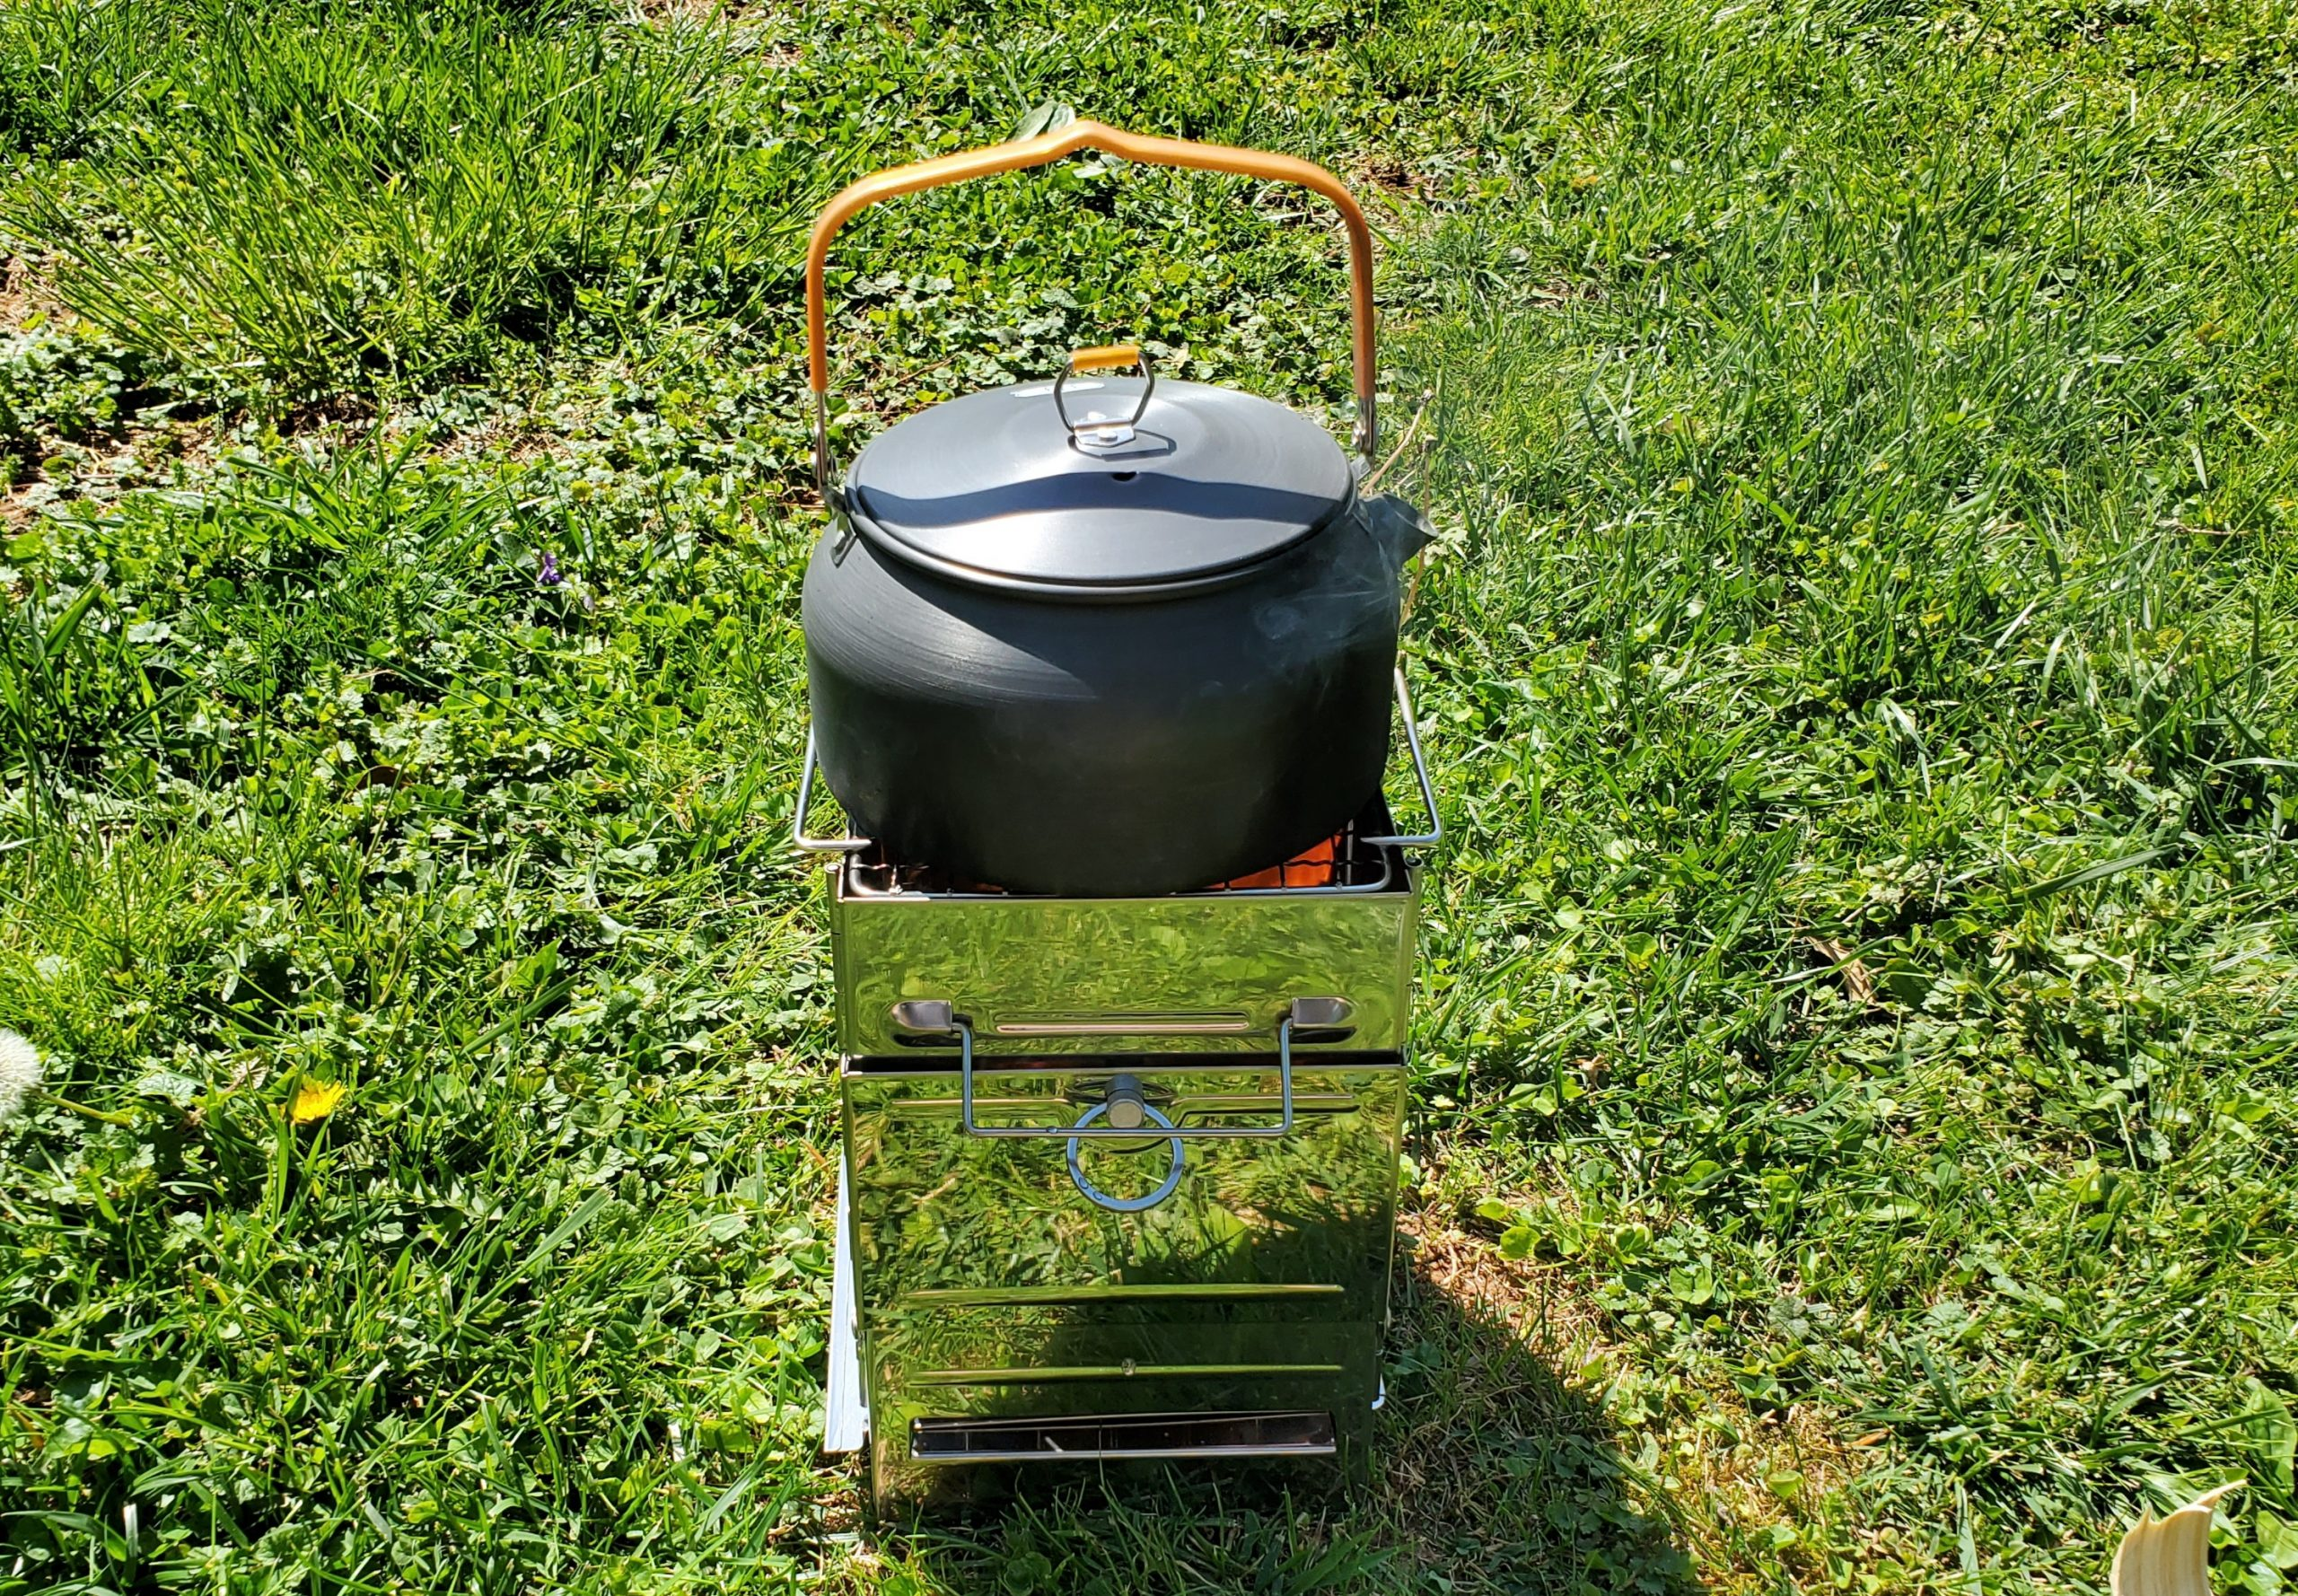 GSI Halulite Camping Tea Kettle